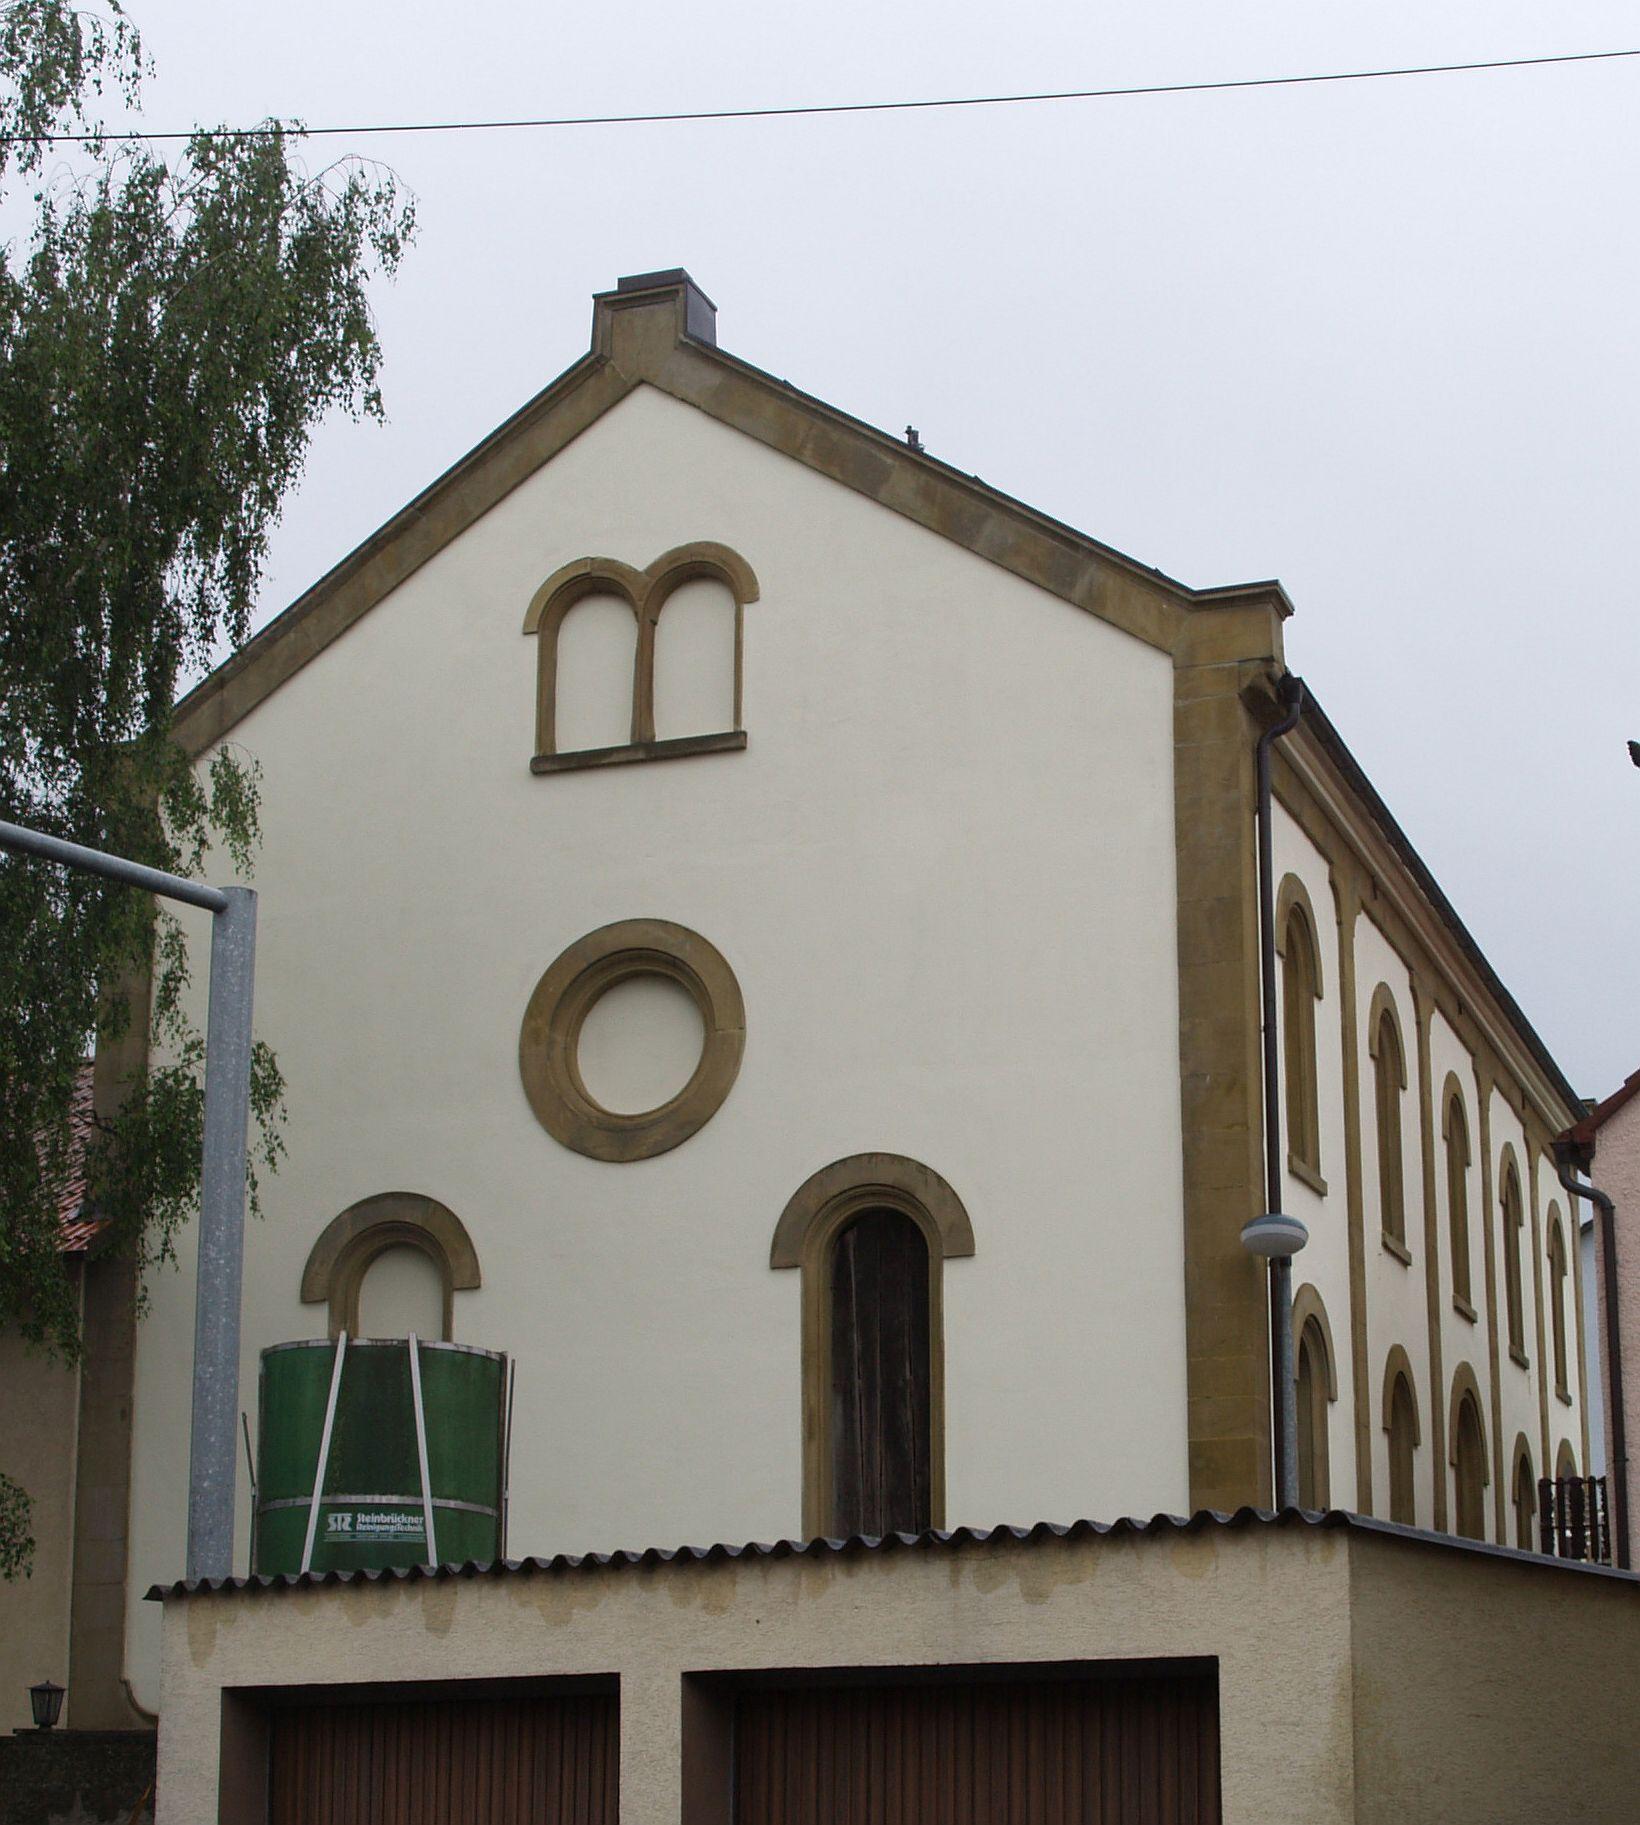 http://www.alemannia-judaica.de/images/Images%20108/Theilheim%20Synagoge%20207.jpg